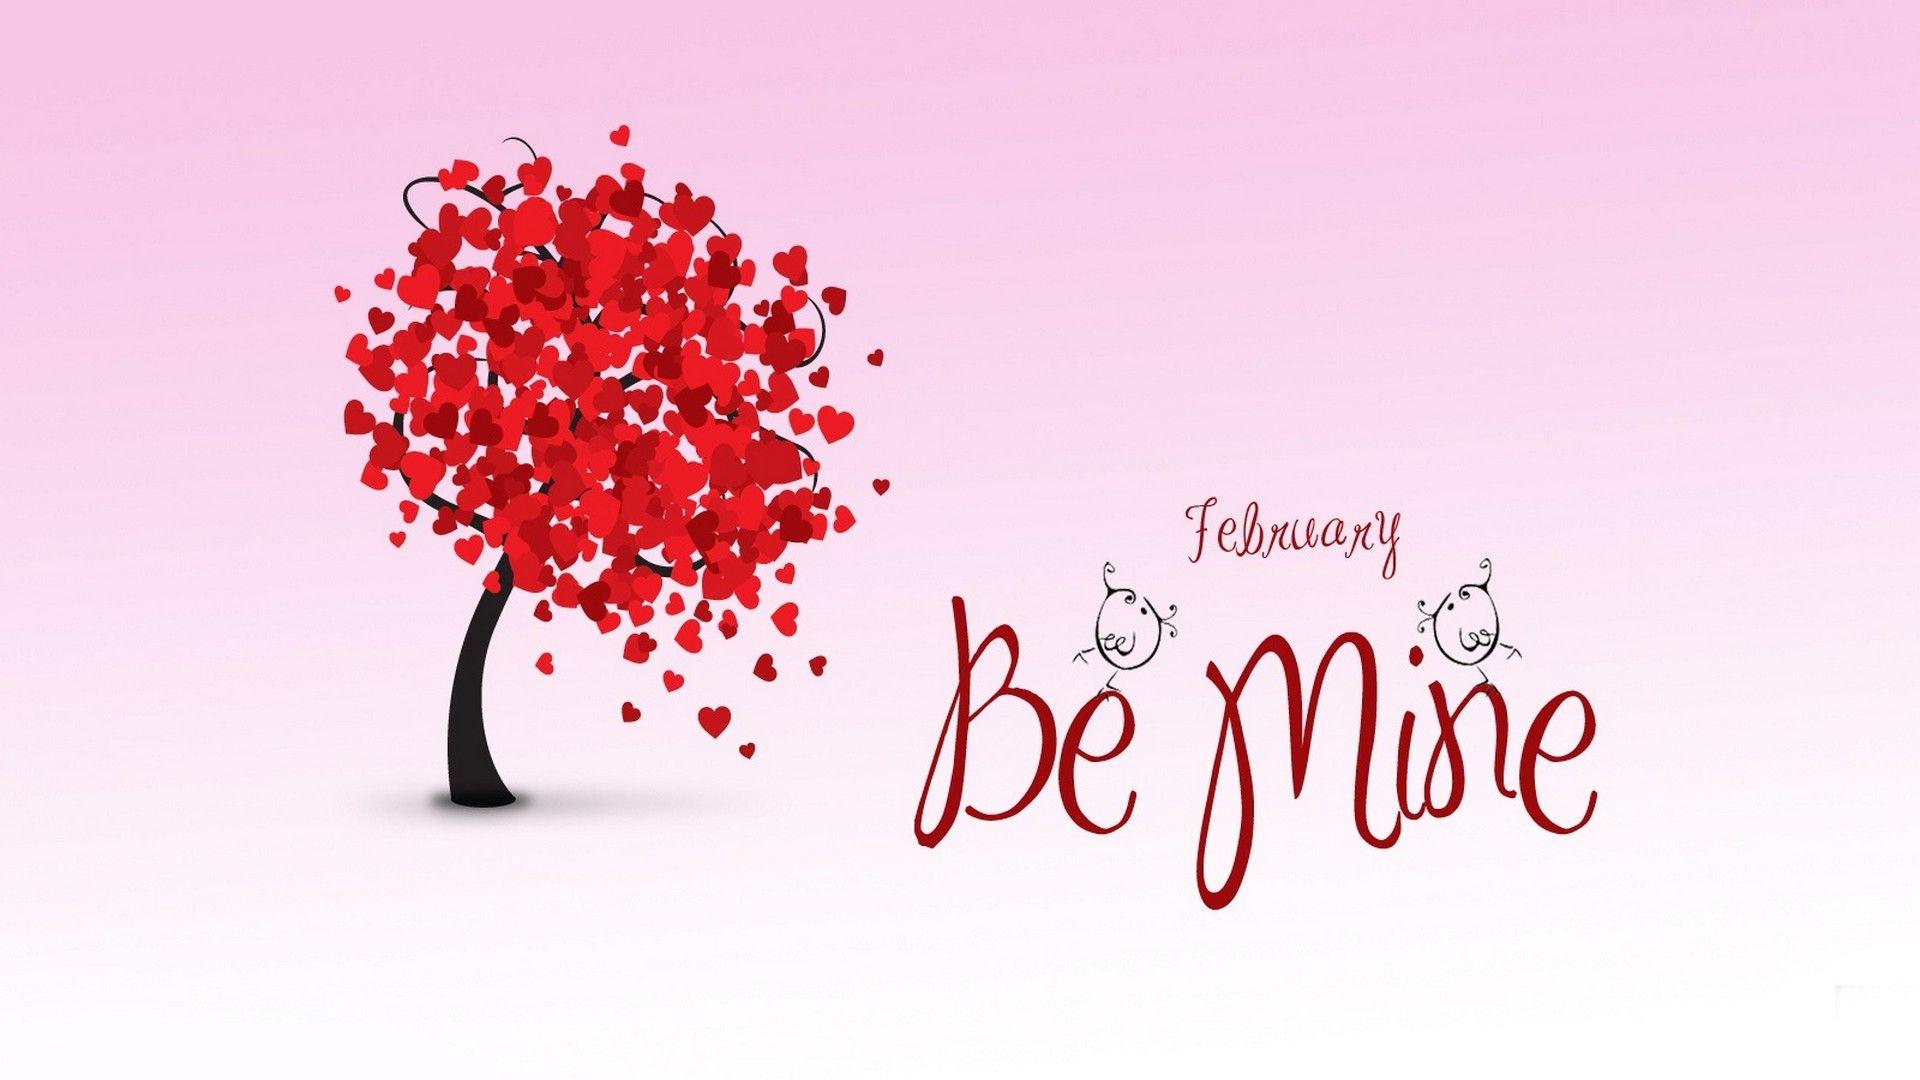 Valentines Be Mine Wallpaper 2021 Live Wallpaper Hd Valentines Day Quotes For Wife Valentines Day Quotes For Husband Happy Valentine Day Quotes